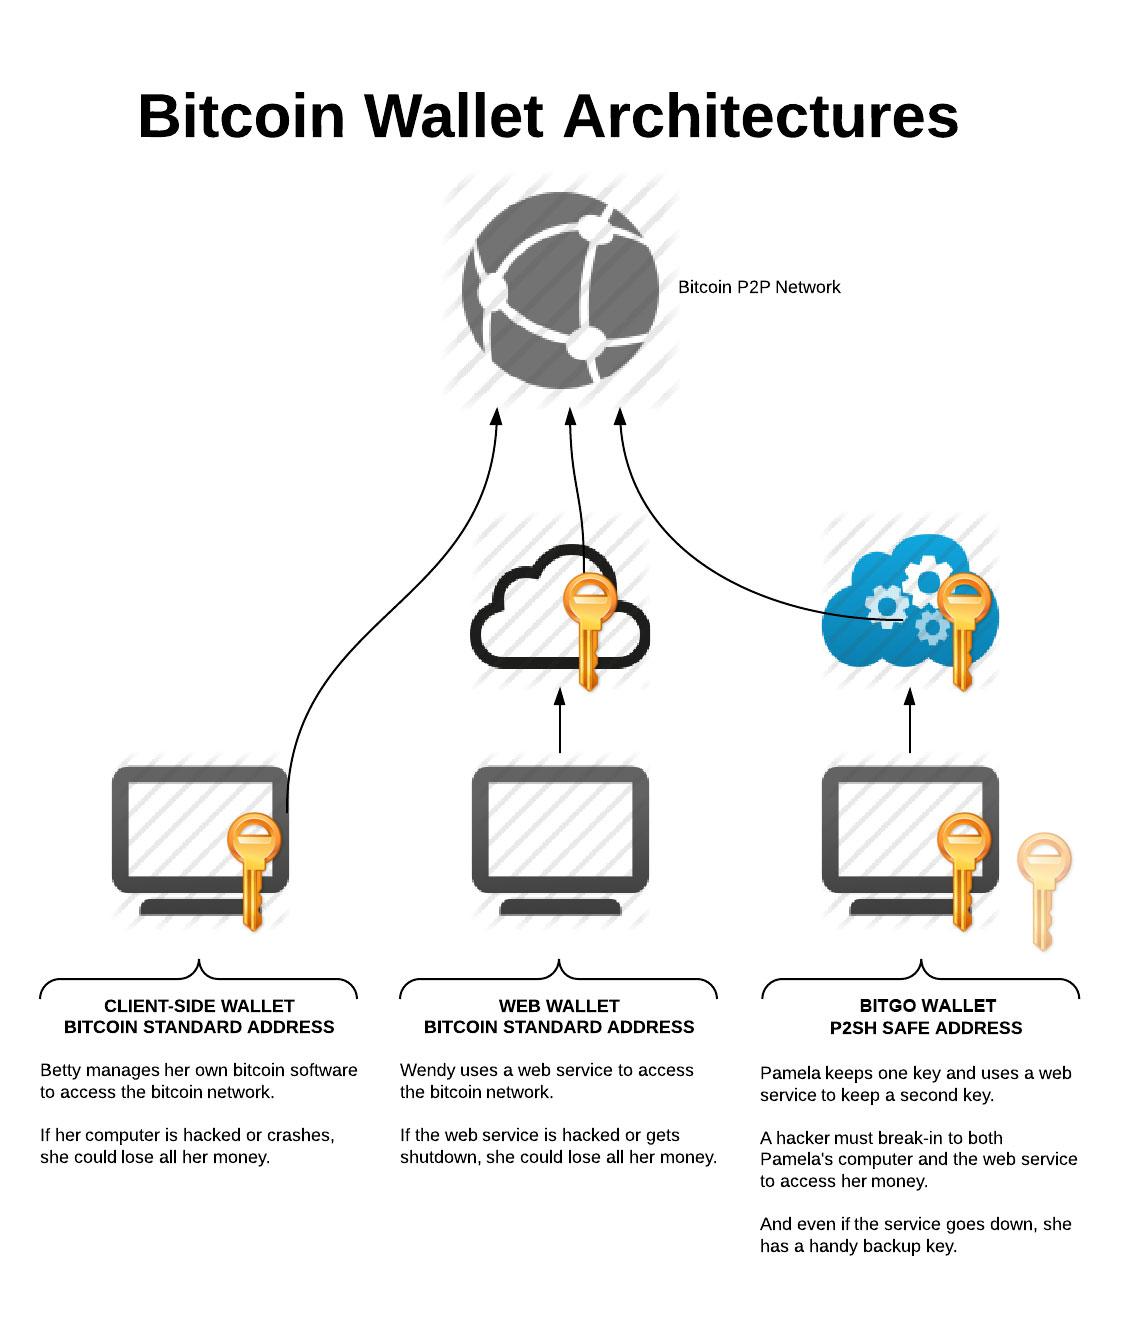 wallet-architecture.4aa3fbd6783e2e9a